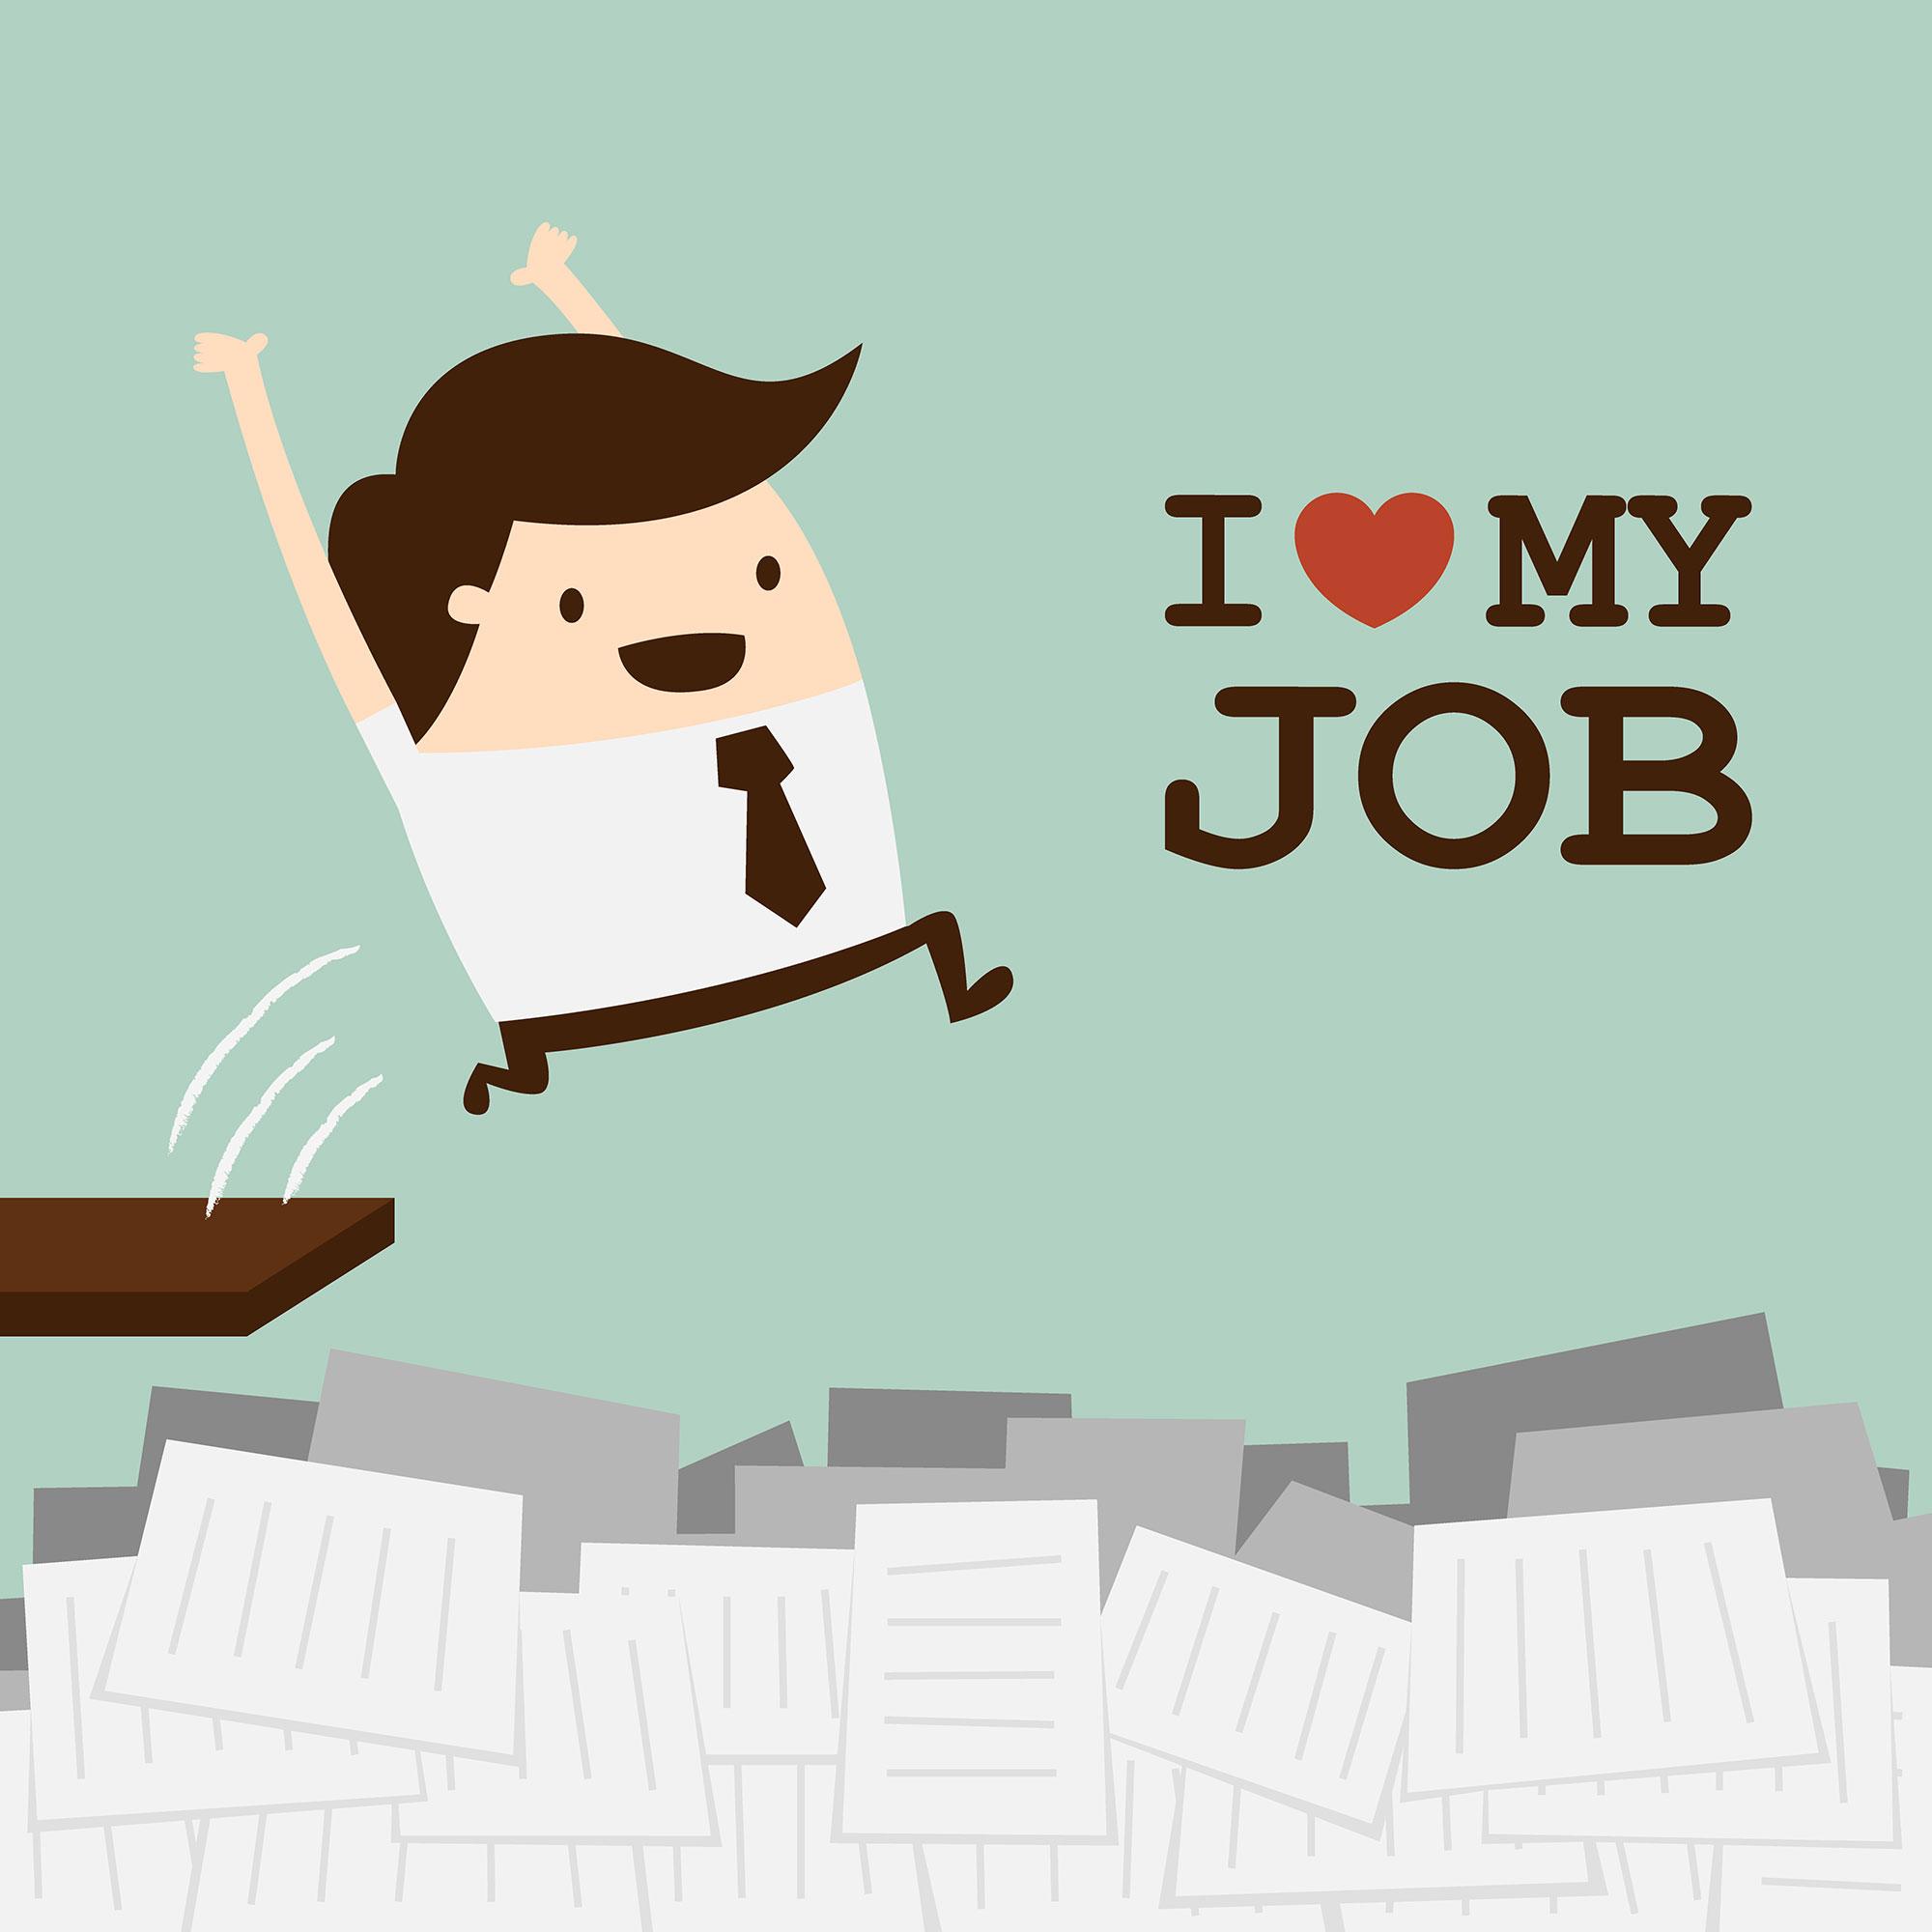 mantech global solutions jobs careers